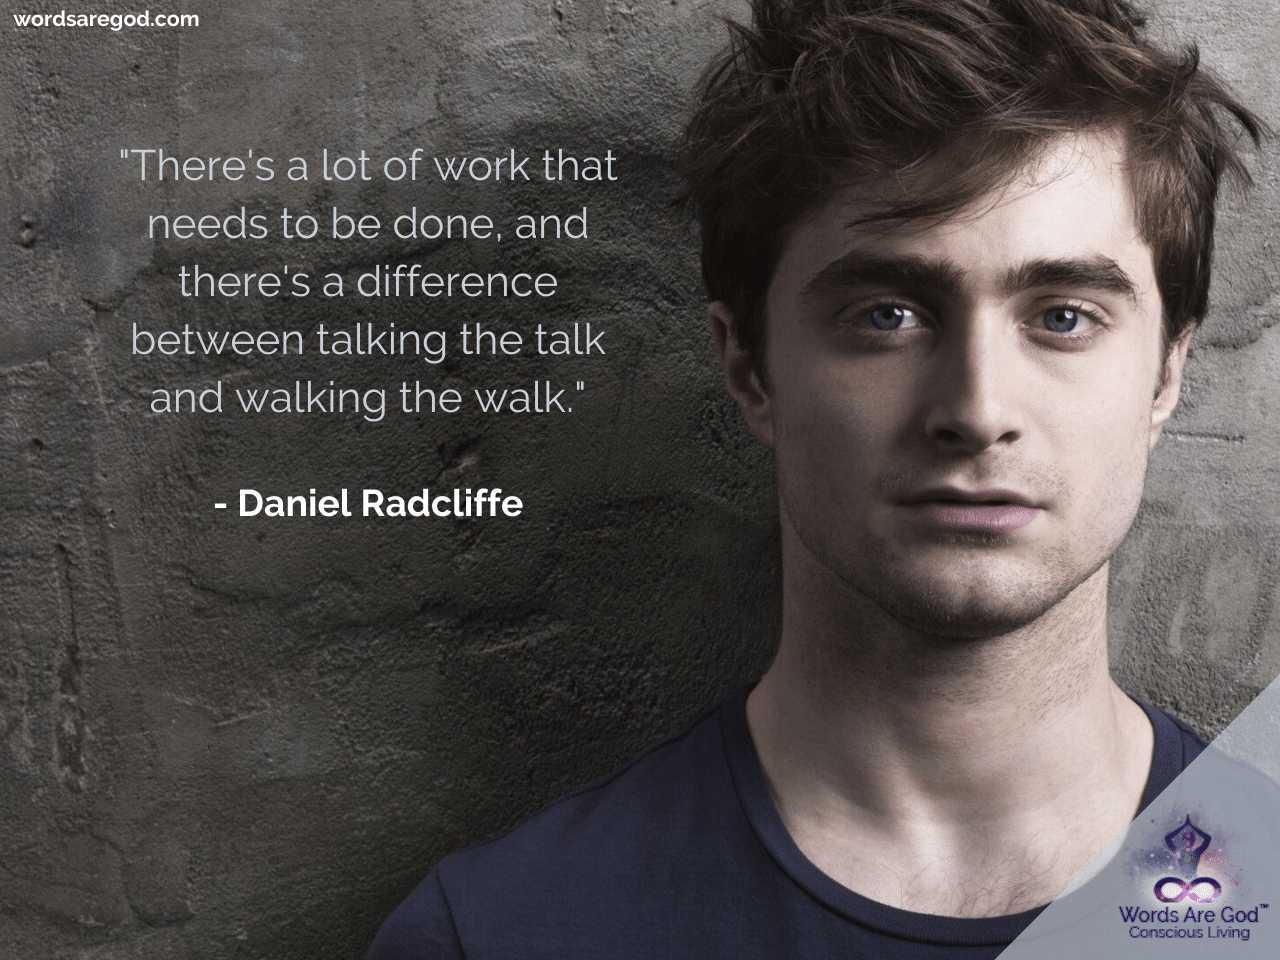 Daniel Radcliffe Motivational Quotes by Daniel Radcliffe